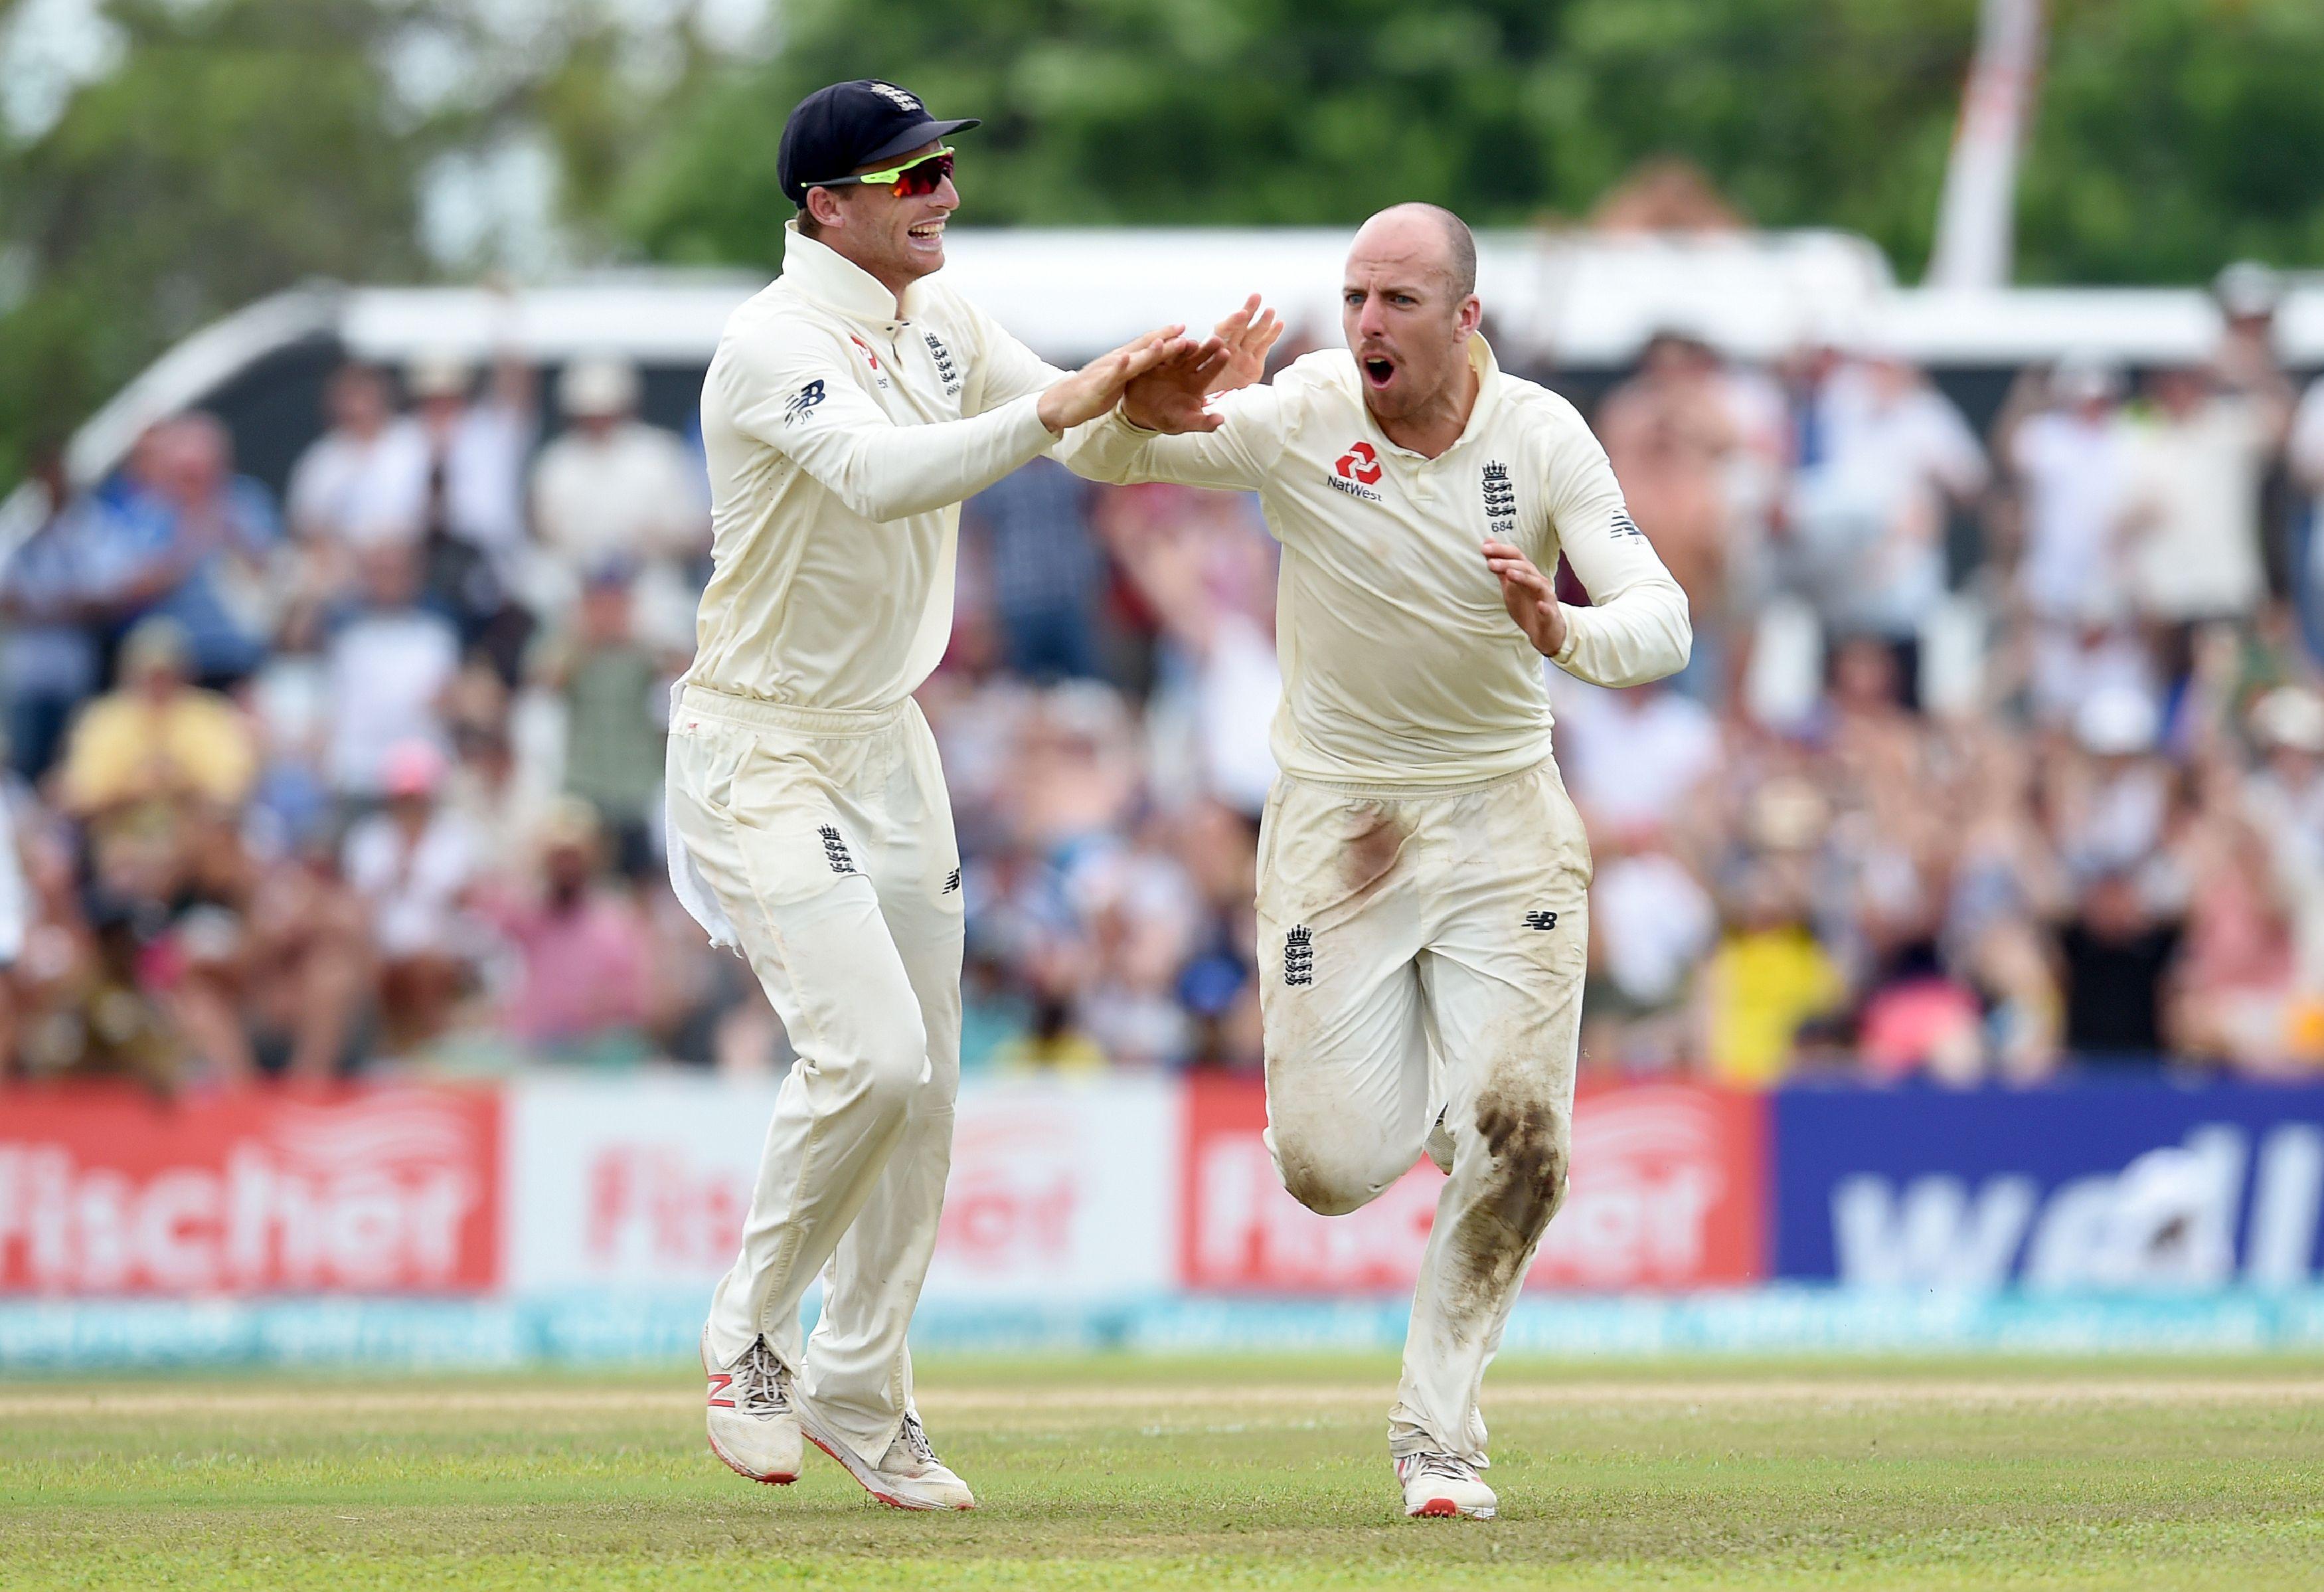 Somerset left-armer Jack Leach took 3-60 as Sri Lanka were bowled over